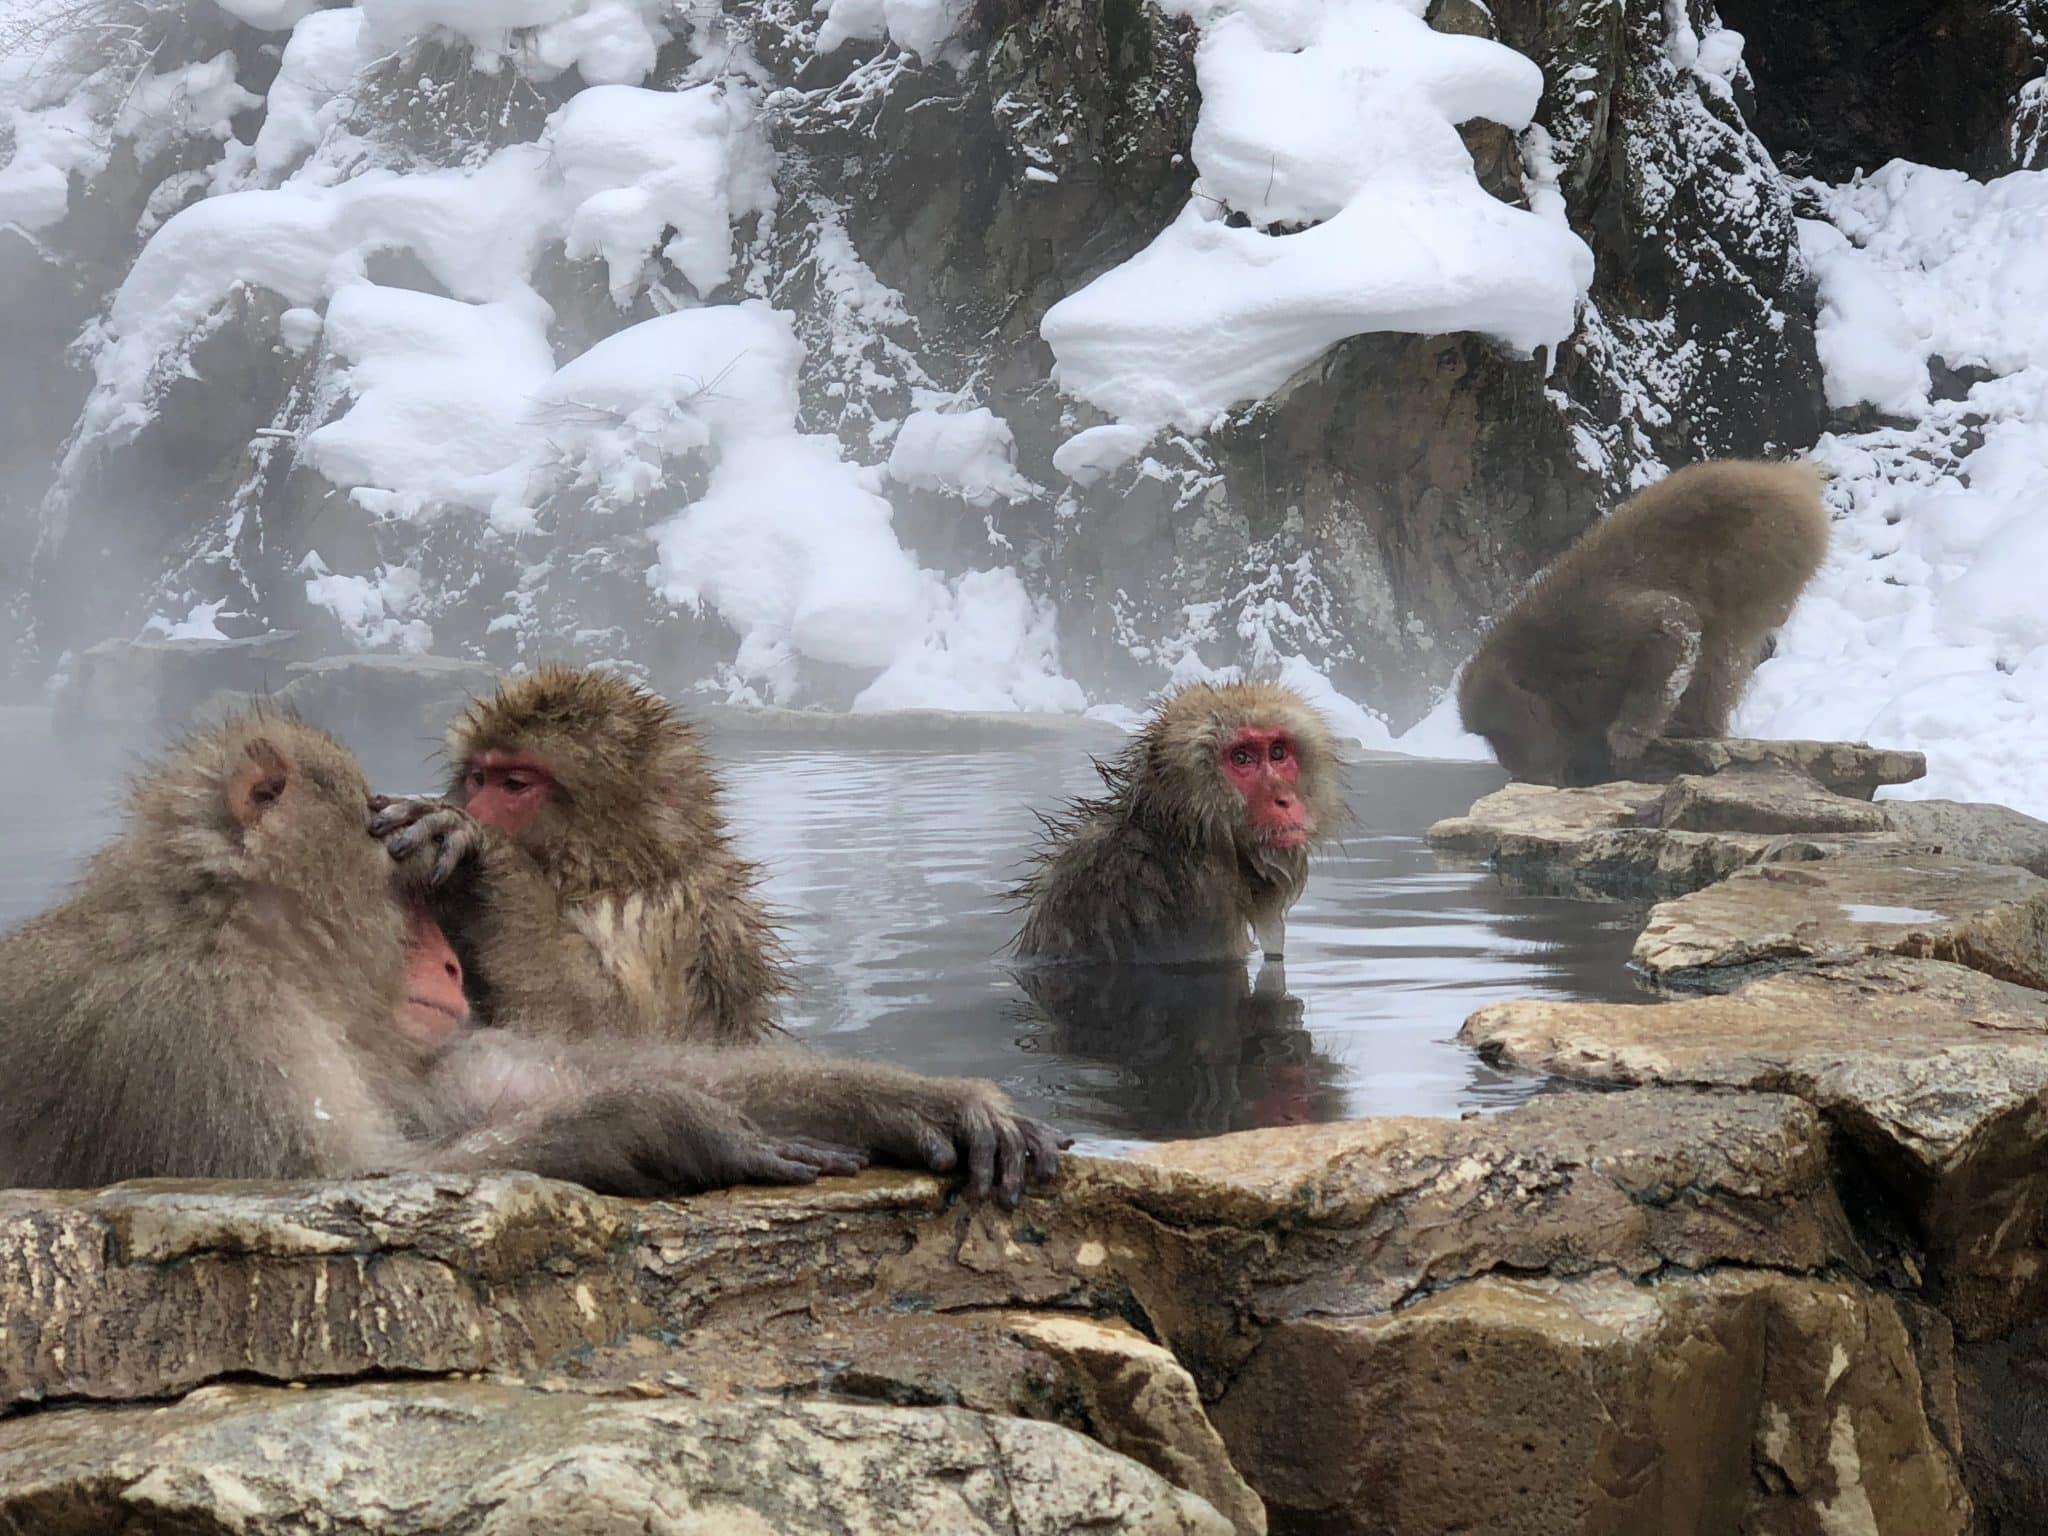 japan-nagano-snow-monkey-soak